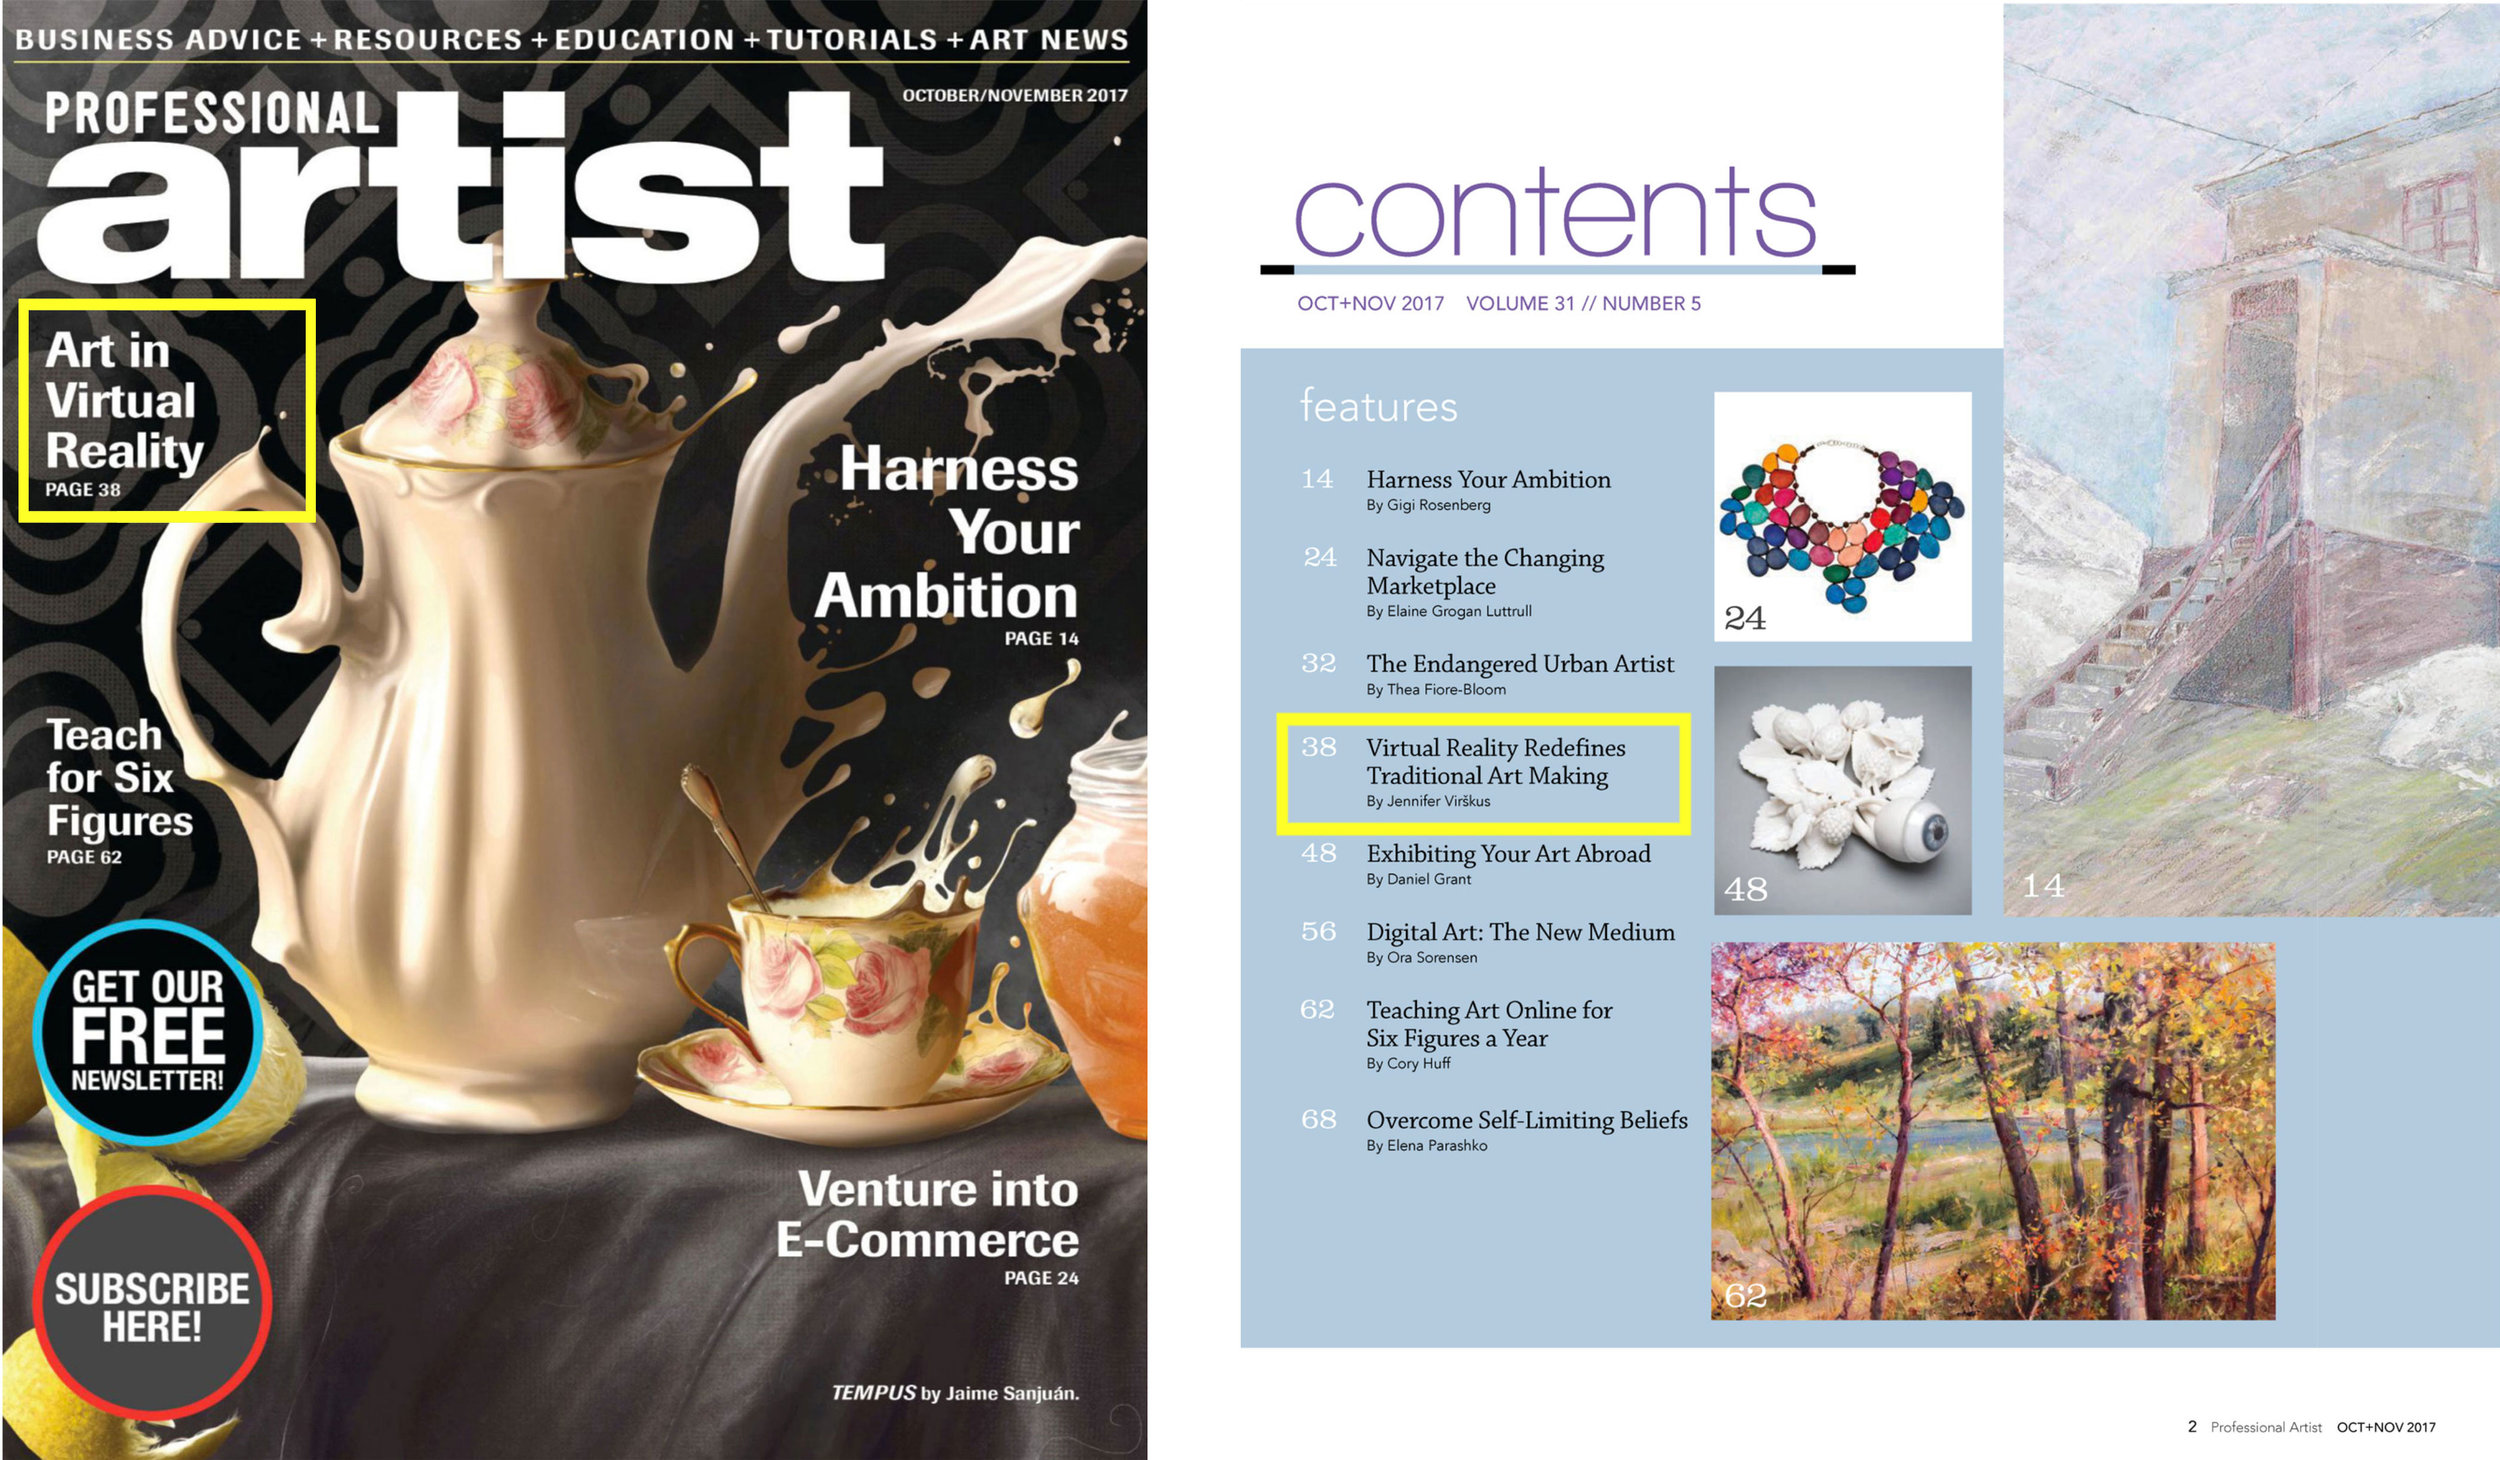 Professional Artist Magazine - Oct/Nov 2017